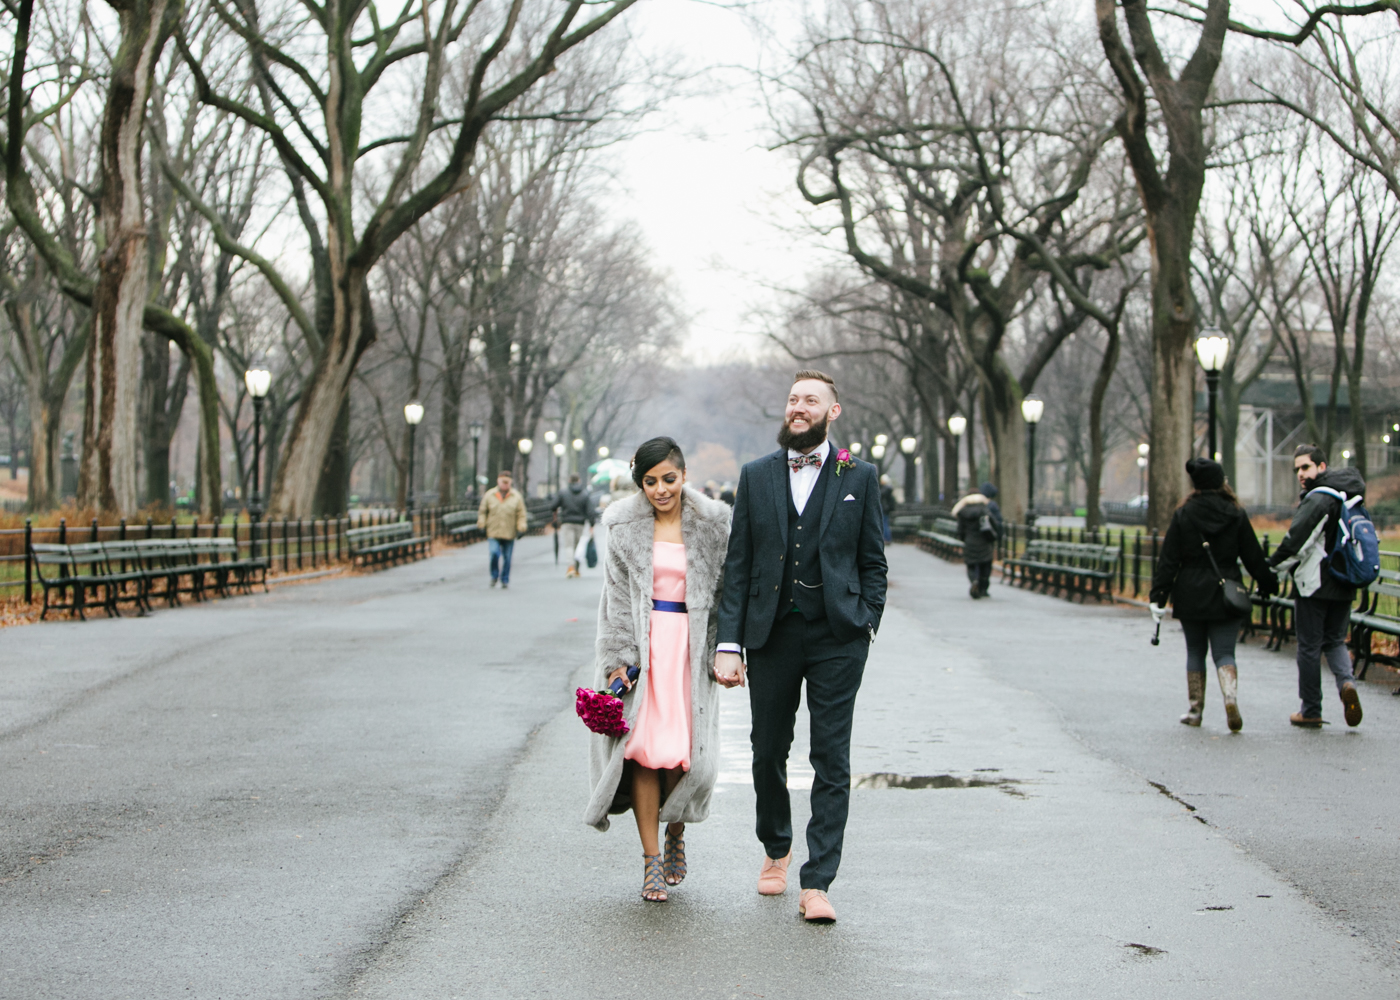 Central-park-wedding-by-Tanya-Isaeva-114.jpg